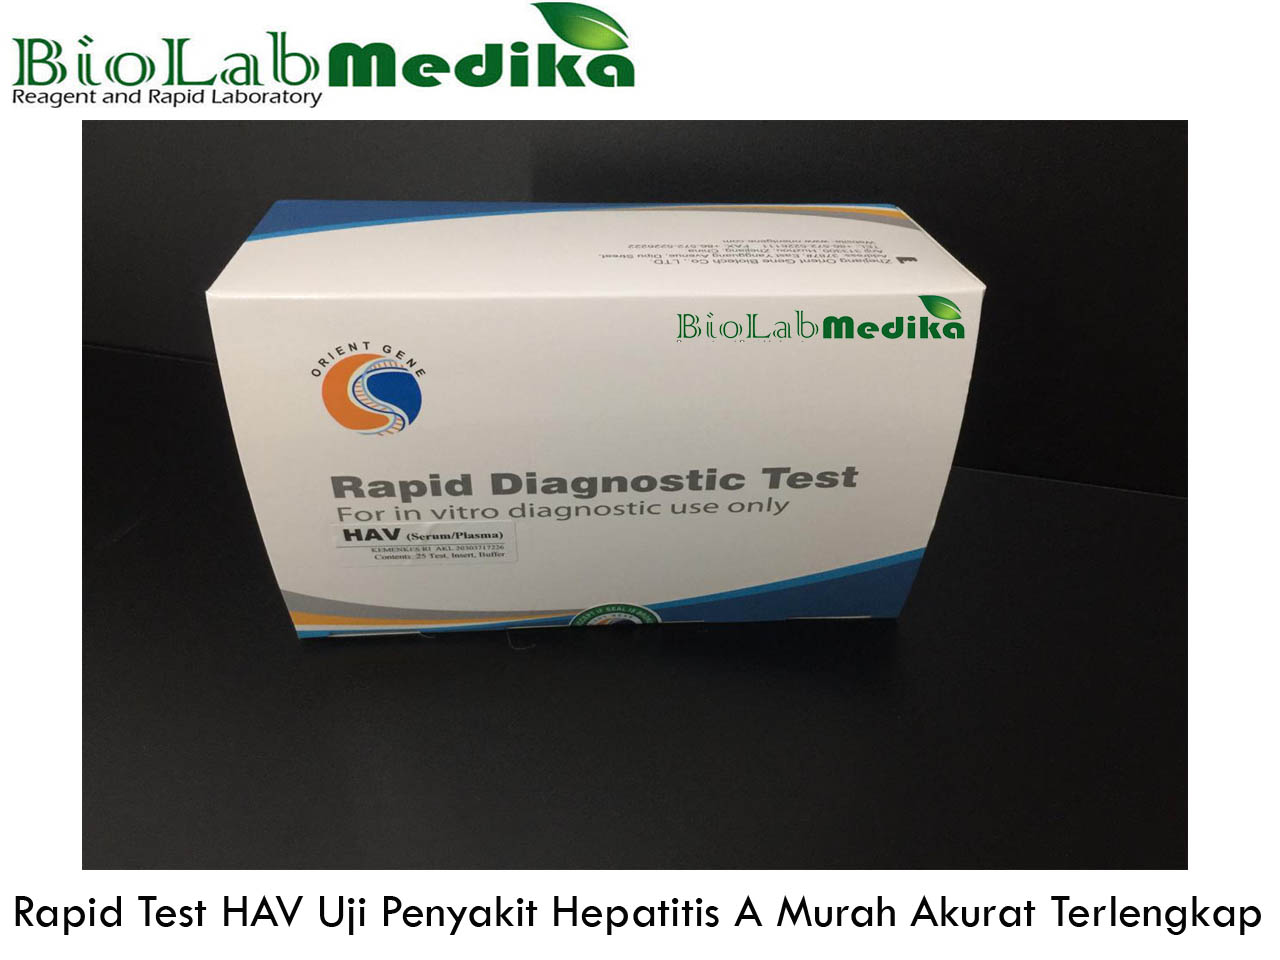 Jual Alat Tes HIV Murah Monotes, Jual Alat Tes Narkoba Urine Multi Parameter, Jual Alat Tes Narkoba Akurat Rapid Test Abon, Jual Alat Test Narkoba, Jual Alat Test Narkoba Multi Parameter, Jual Alat Test Narkoba Urine Monotes, Jual Alat Test Narkoba Urine Multi Parameter, Jual Alat Test Urine Narkoba Rapid 1 3 5 6,Test Morphin murah, Test Narkoba 3 parameter monotes, test narkoba cocaine strip, THC monotes murah, Toko jual Amp Card, toko jual met card monotes, Toko Jual Monotes 5 Parameter, Toko jual Monotes 6 Parameter, Toko Jual Multi 3 Panel Monotes, Toko Jual Rapid Monotes, Toko jual rapid test monotes, Toko jual rapid test THC Monotes, toko jual test narkoba murah jakarta, distributor rapid test monotes jakarta, distributor rapid tes monotes tangerang selatan, agen resmi rapid test montes di Jakarta, agen resmi rapid test monotes di Tangsel, toko rapid test lengkap harga murah, daftar harga rapid test monoes terbaru, supplier rapid test monotes di Indonesia, supplier rapid test monotes Jakarta, supplier rapid test monotes Tangerang Selatan, Jual rapid monotes multi 6 p narkoba harga murah, lokasi alamat tempat lapak penjual alat cek test strip urine drugs narkotika napza multi 6 parameter merk monotes harga murah, alat tes monotes, jual rapid test multi 6 montes, Rapid test drugs multi 6 parameter monotes, Rapid test monotes multi drugs abuze multi 5, Monotes 5 Parameter, Monotes 3 Parameter, Monotes 5 Panel,Harga Alat Test Narkoba 3 Parameter, Harga Alat Test Narkoba Murah Monotes, Harga Alat Uji Narkoba, Harga Baju Tindakan Operasi Baju OK murah, Harga Jual Rapid Test Monotes, Harga Mikroskop Siswa Monokuler XSP12, Jual Alat Uji Napza Murah Tangerang Selatan, Jual Alkes Medis Murah Di Jakarta, Jual Amphetamine Test Monotes, Jual Baju Pasien Rumah Sakit Murah, Jual Bed Pasien Murah, Jual Centrifuge Harga Murah Di Jakarta, Jual Kursi Roda Murah Di Tangerang Selatan, Jual Macam Macam Reagen Murah, Jual Meja Periksa Murah, Jual Mikroskop Digital Murah, Jual MultiD